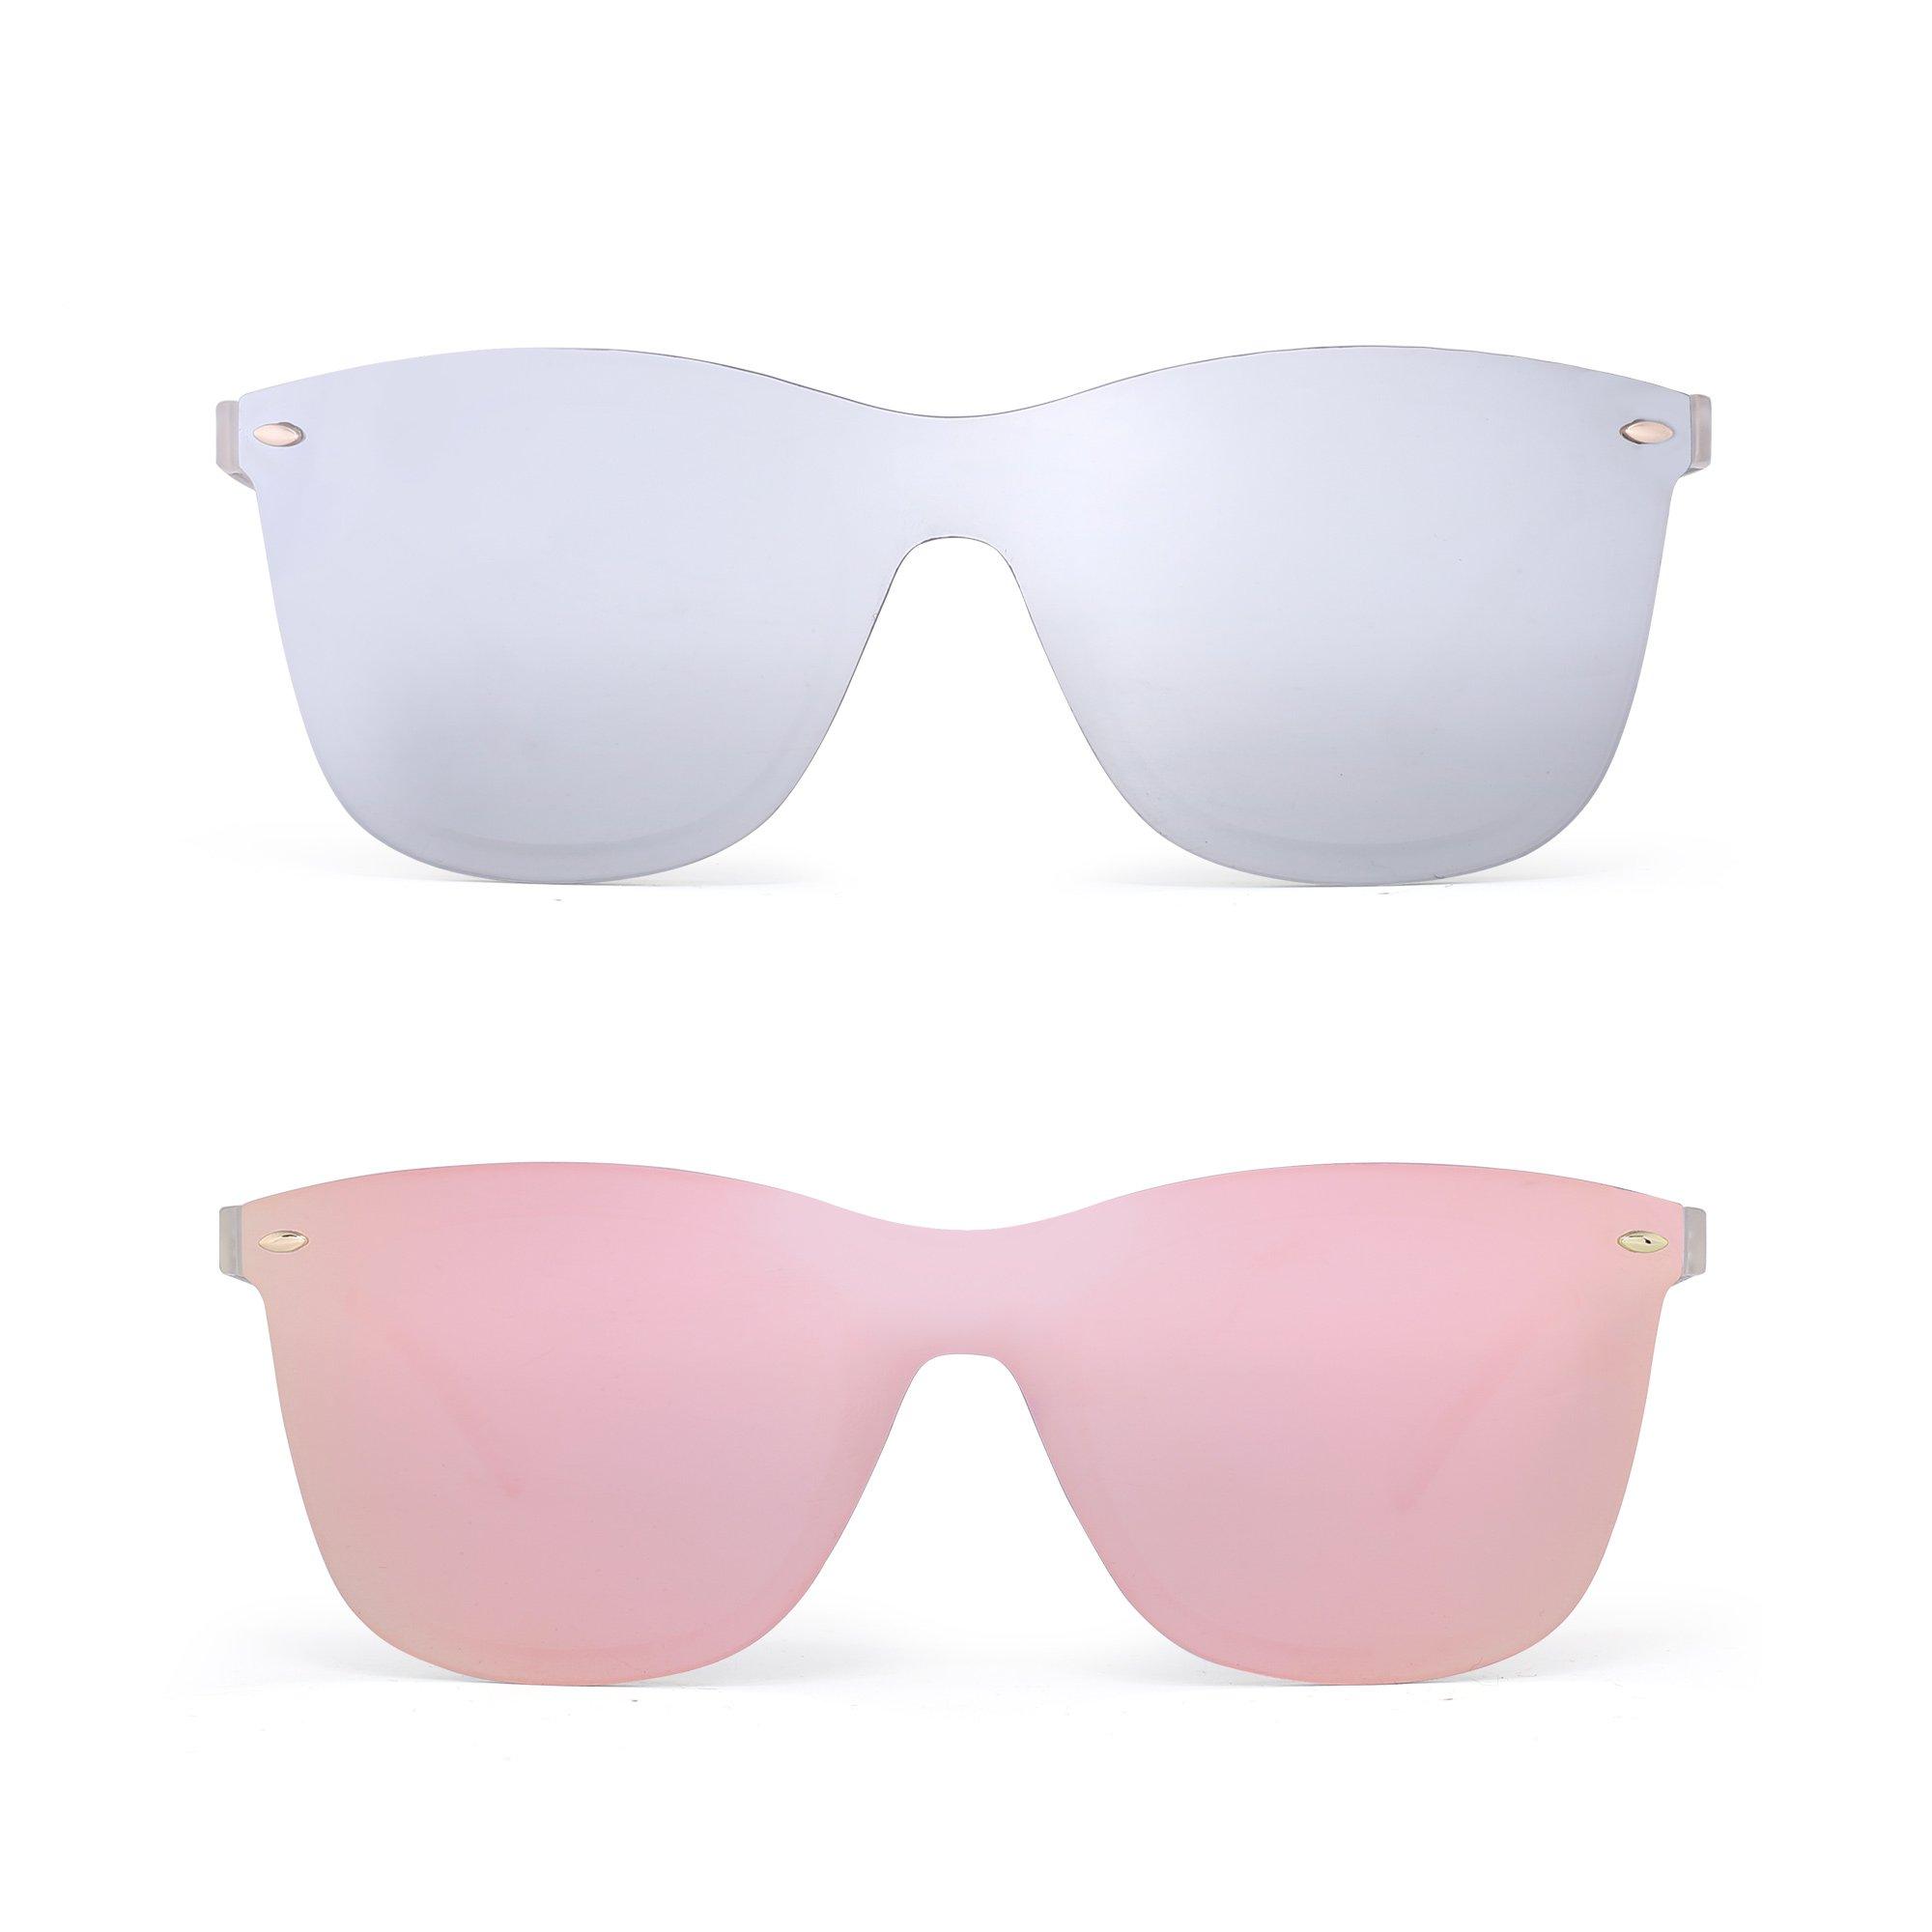 Rimless Mirrored Sunglasses One Piece Frameless Eyeglasses Men Women 2 Pack (Silver & Pink)